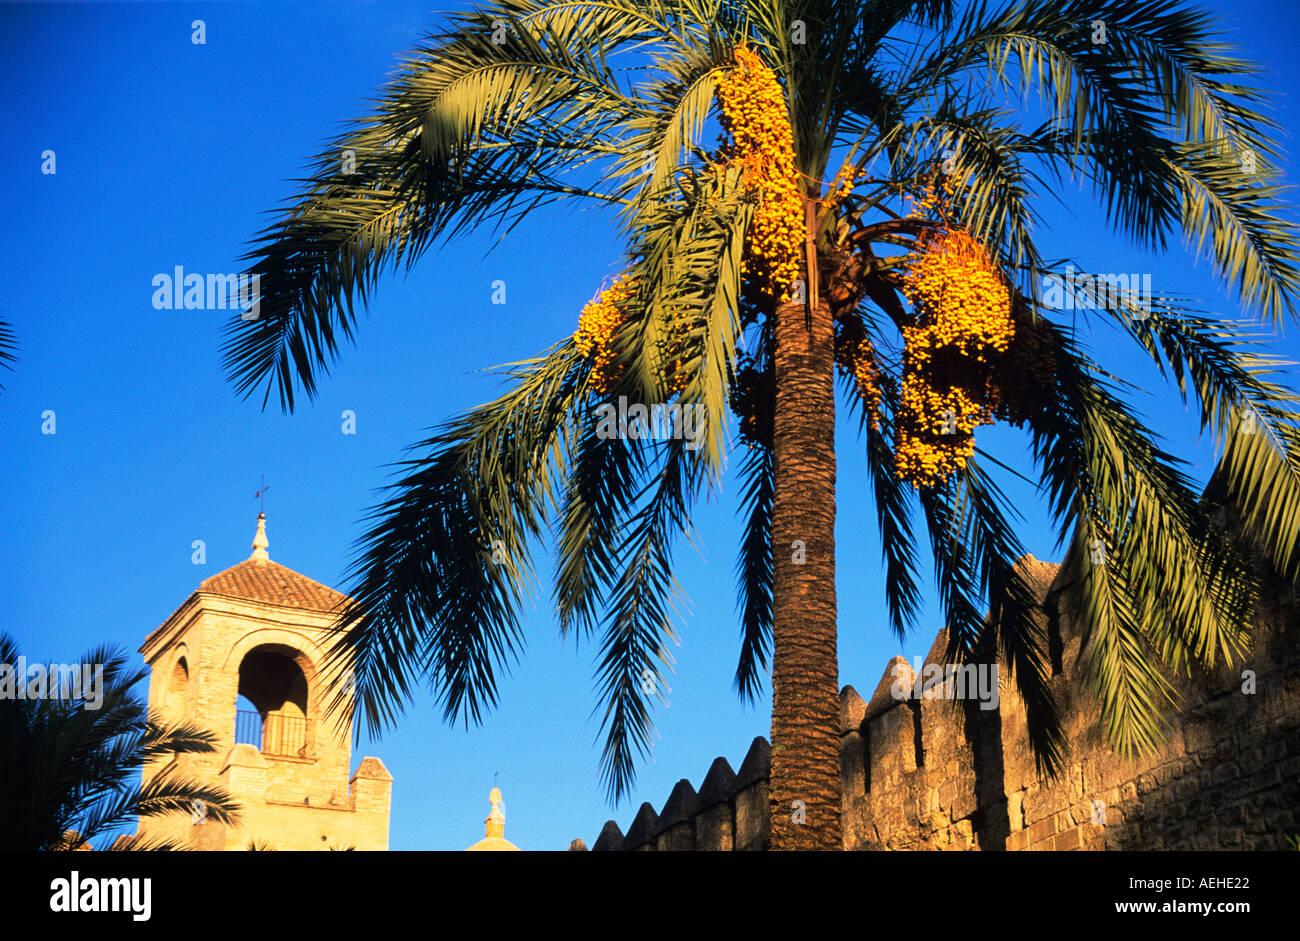 Alcazar de Los Reyes Cristianos, Córdoba, Andalusien, Spanien. Stockbild